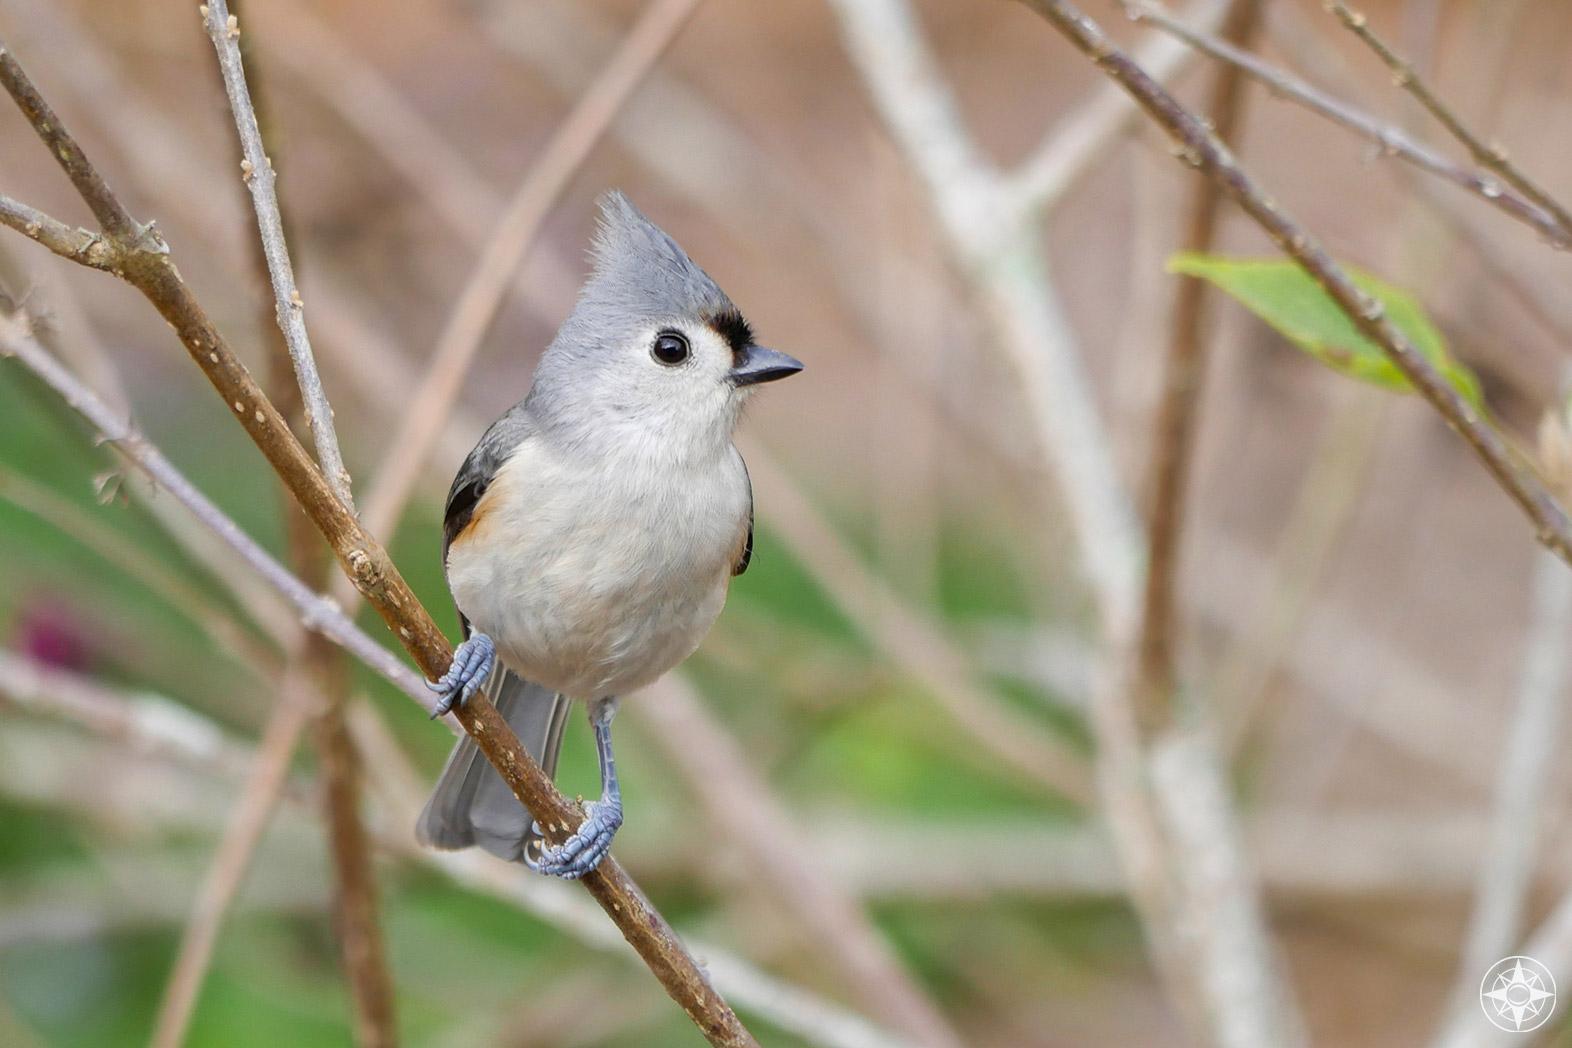 Tufted Titmouse, shrub, beauty bush, Great Backyard Bird Count, Happier Place